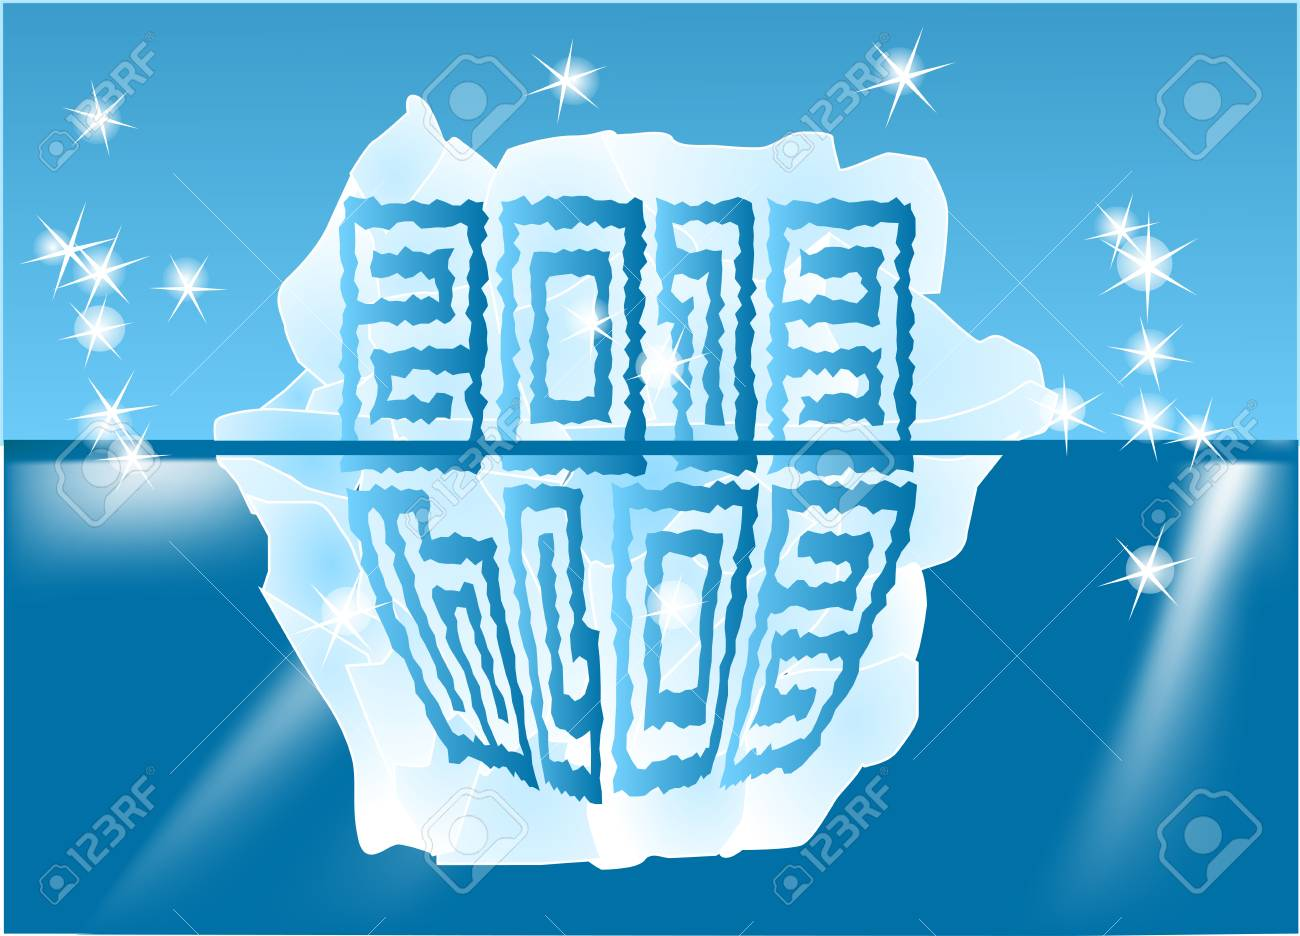 New Year sign on an iceberg 2013-2014 Stock Vector - 15026564